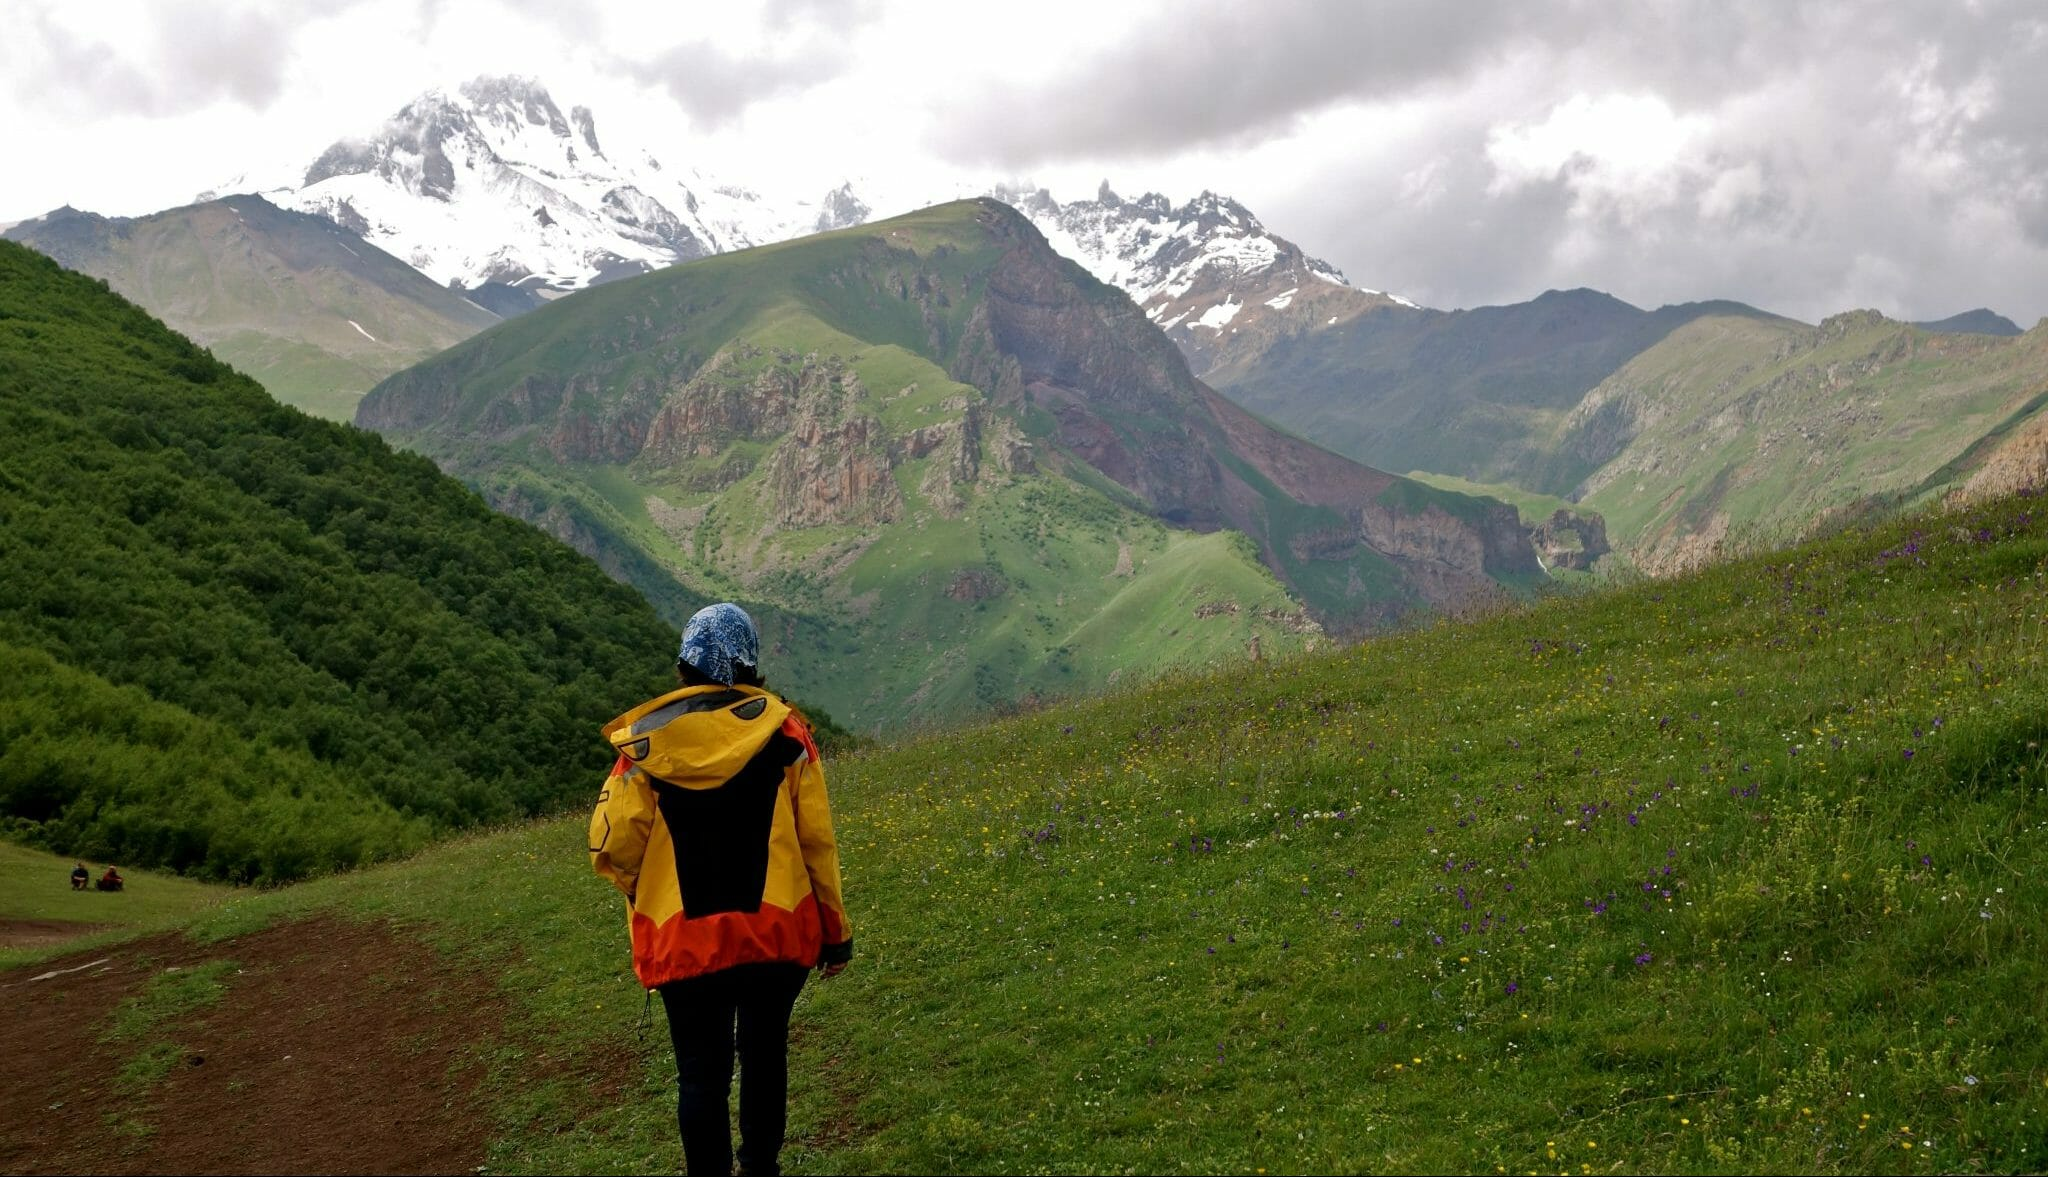 gorgia e1488382009681 - الشمال التركي وجهة سياحة رائعة ماذا تعرف عنه؟